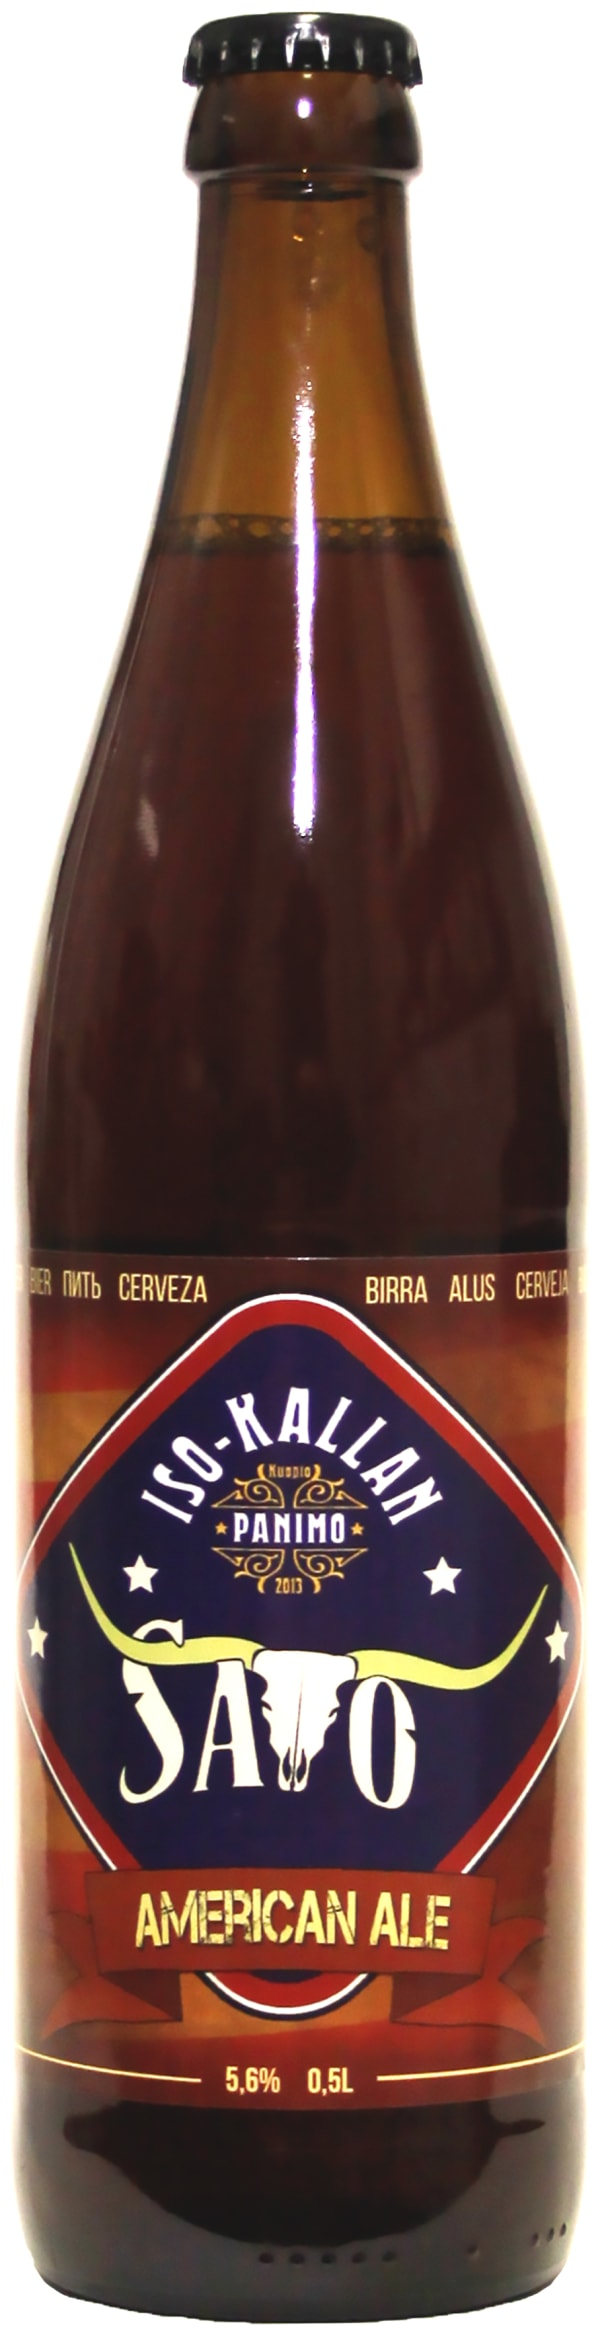 Iso-Kallan Savo American Ale